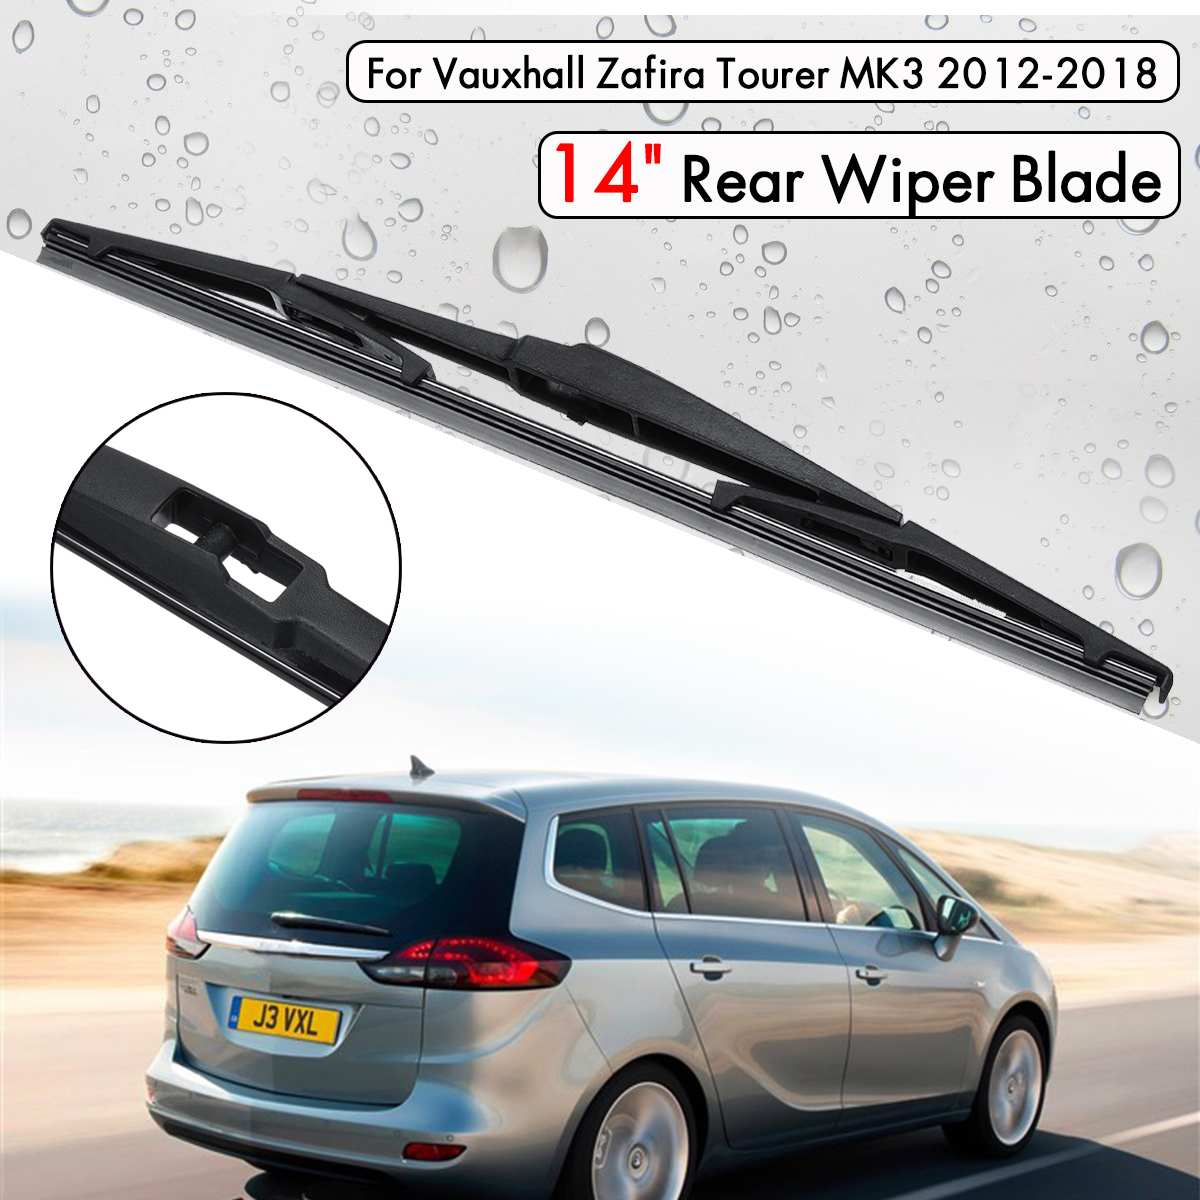 Custom Rubber Car Mats to fit Vauxhall Zafira C Tourer 7 Seater 2012-present